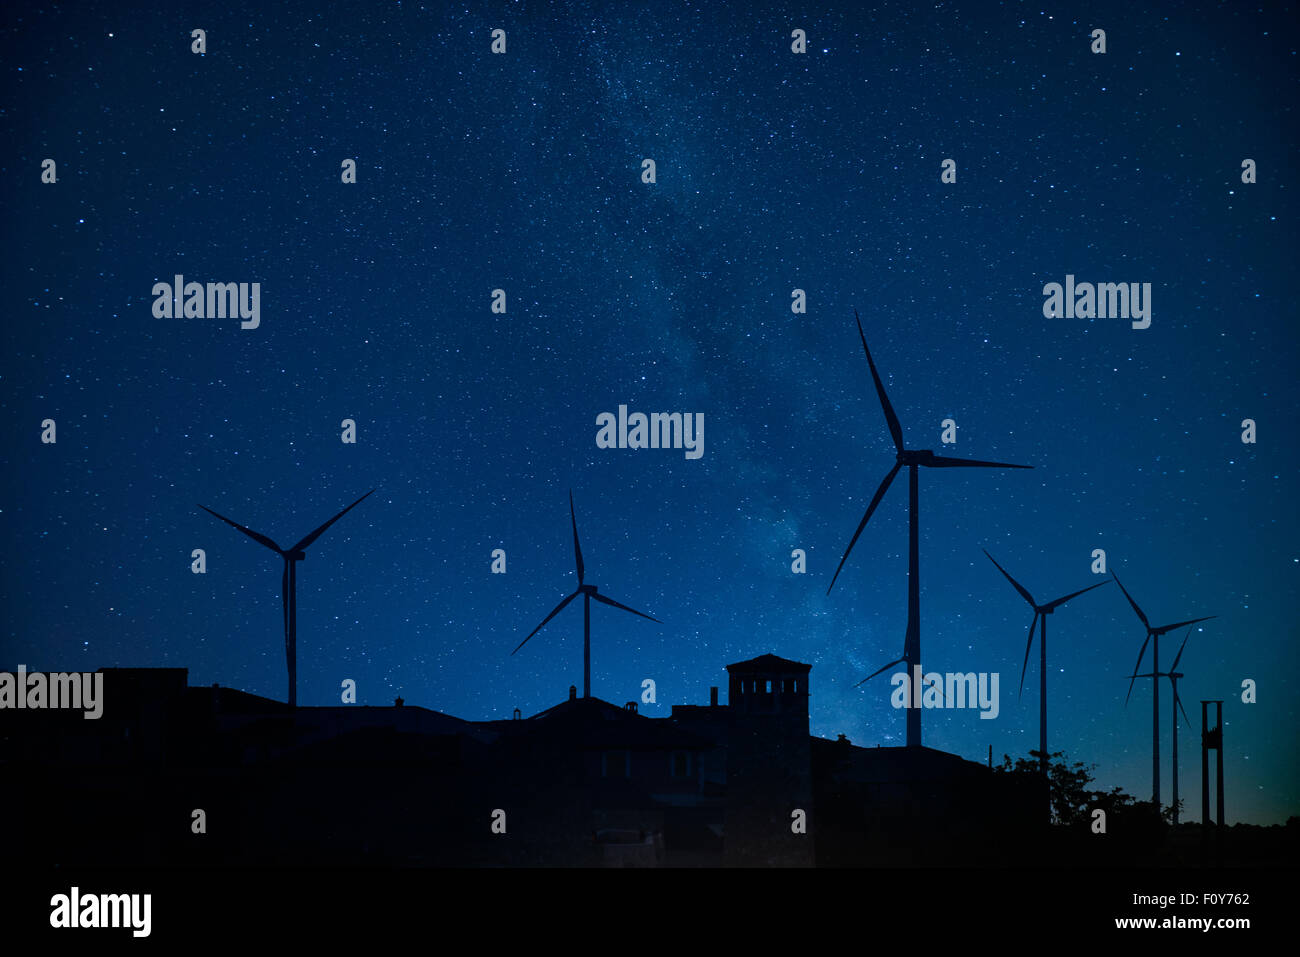 Milky way behind a windmill farm. - Stock Image